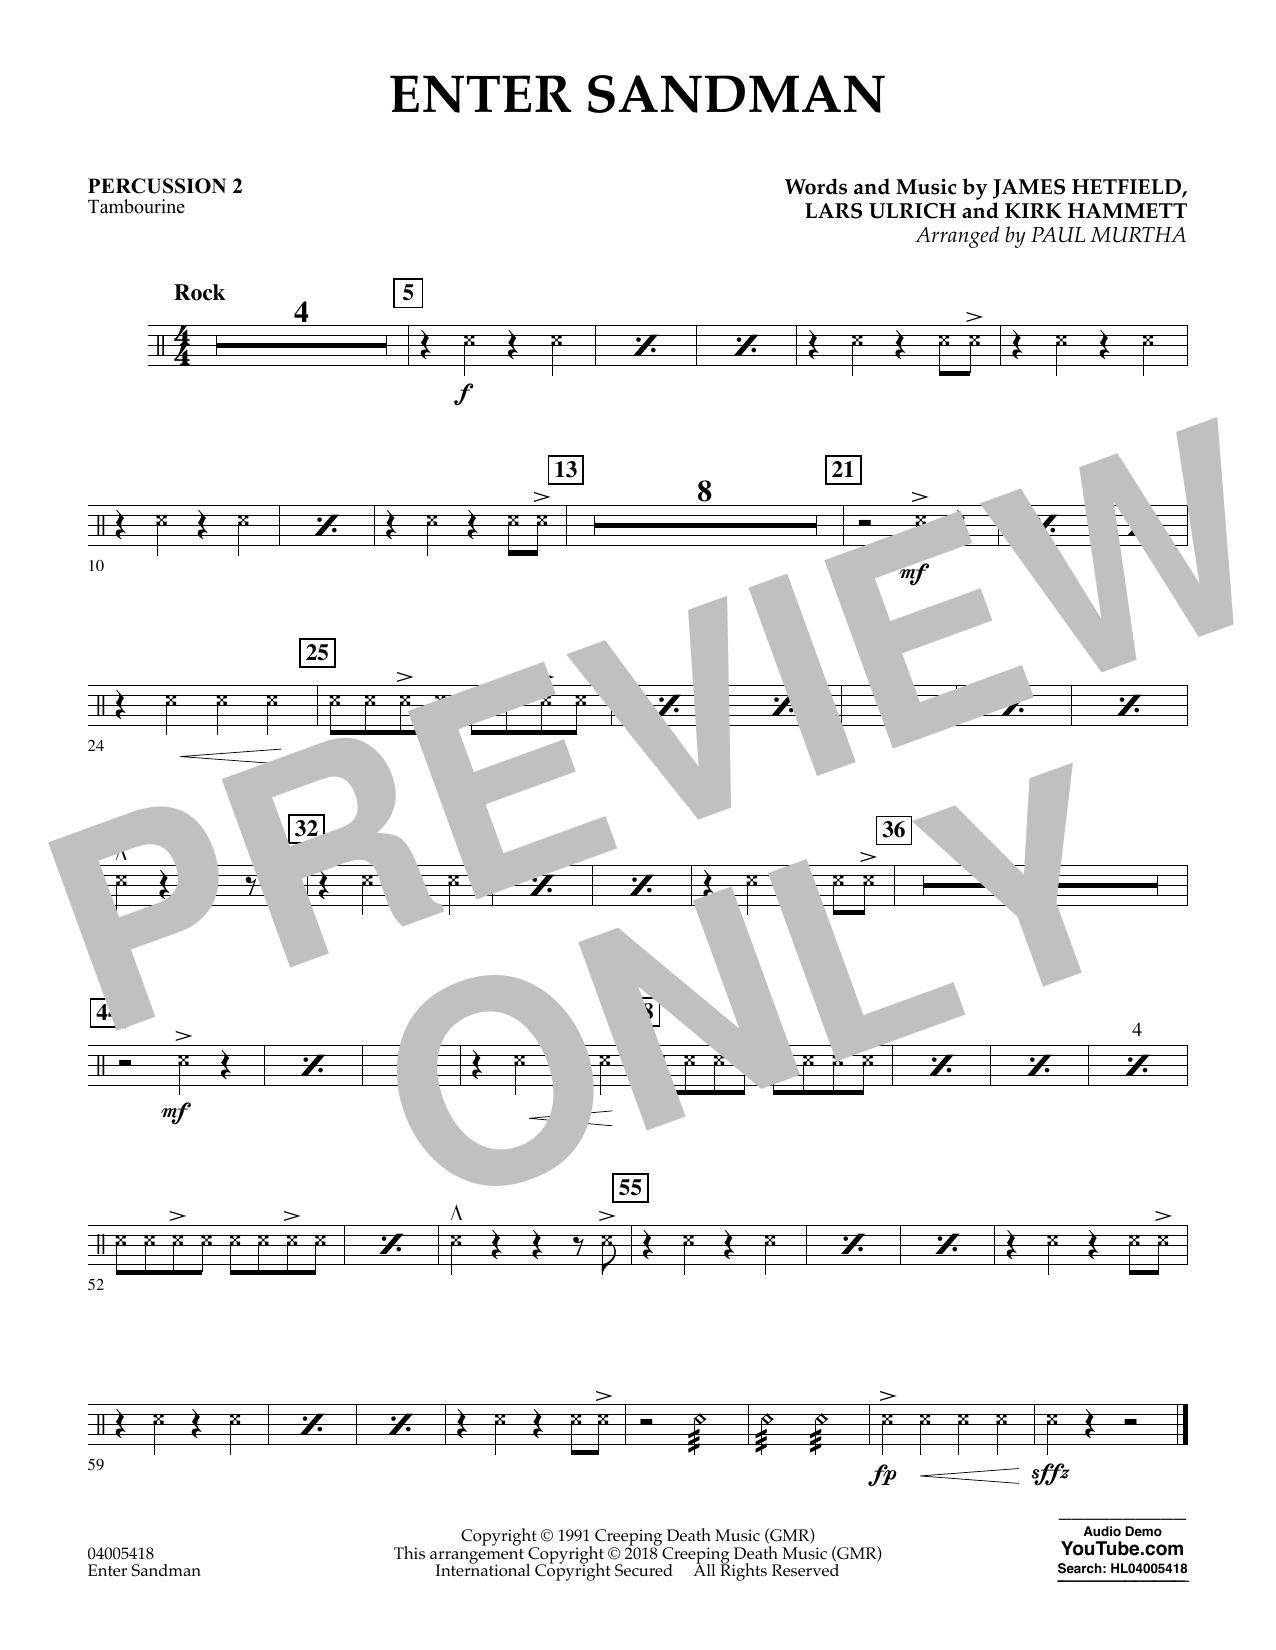 Paul Murtha Enter Sandman - Percussion 2 sheet music notes and chords. Download Printable PDF.